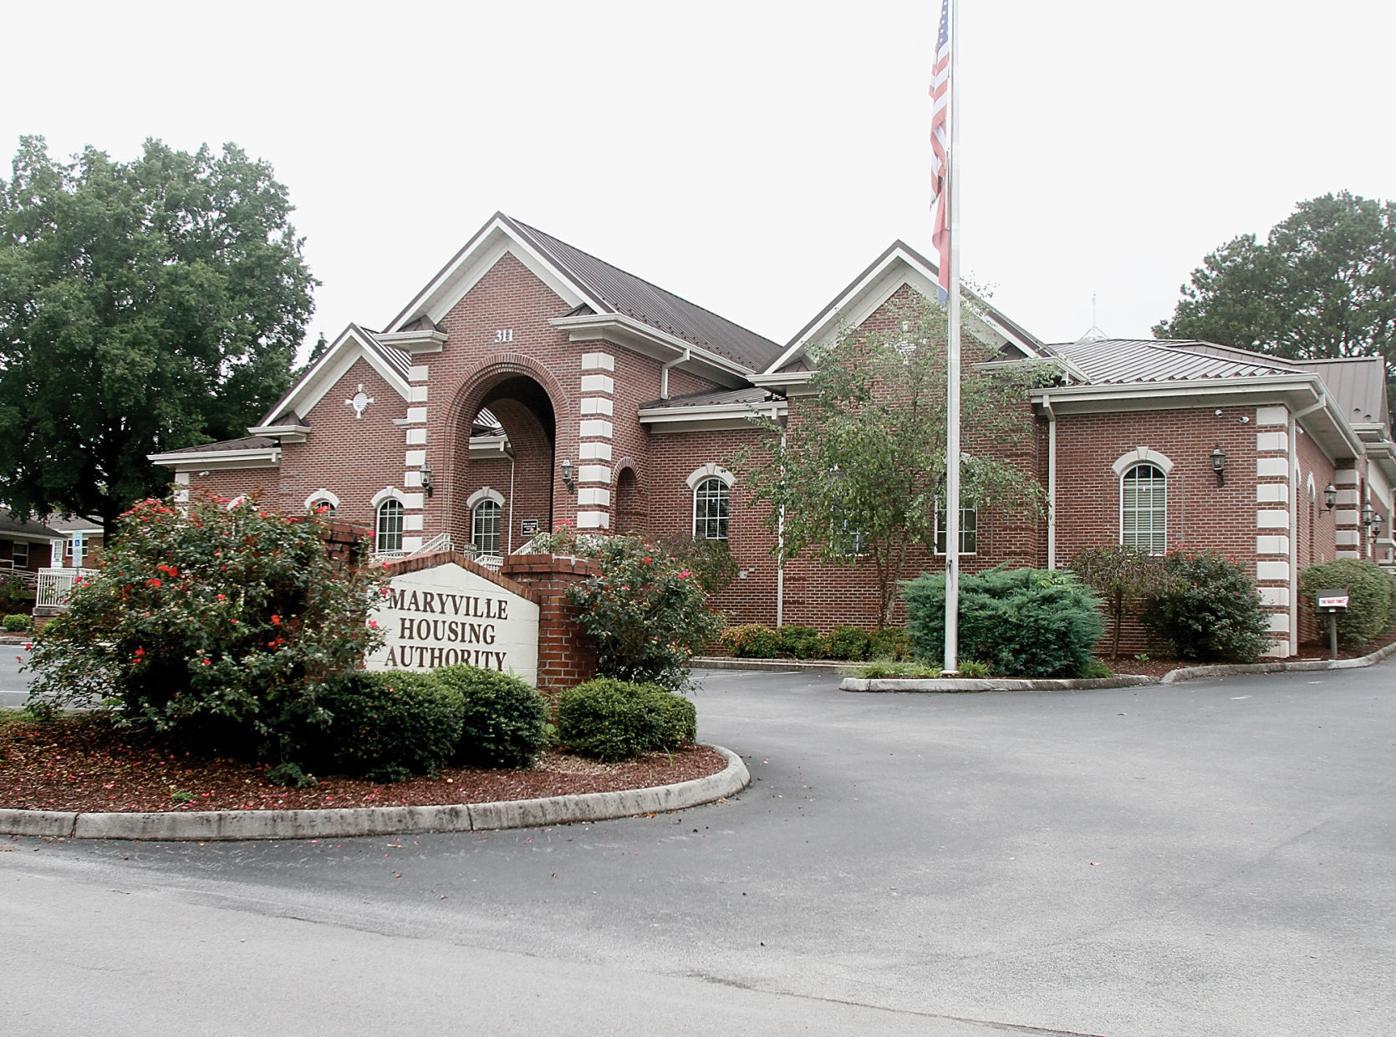 Maryville Housing Authority (2021)